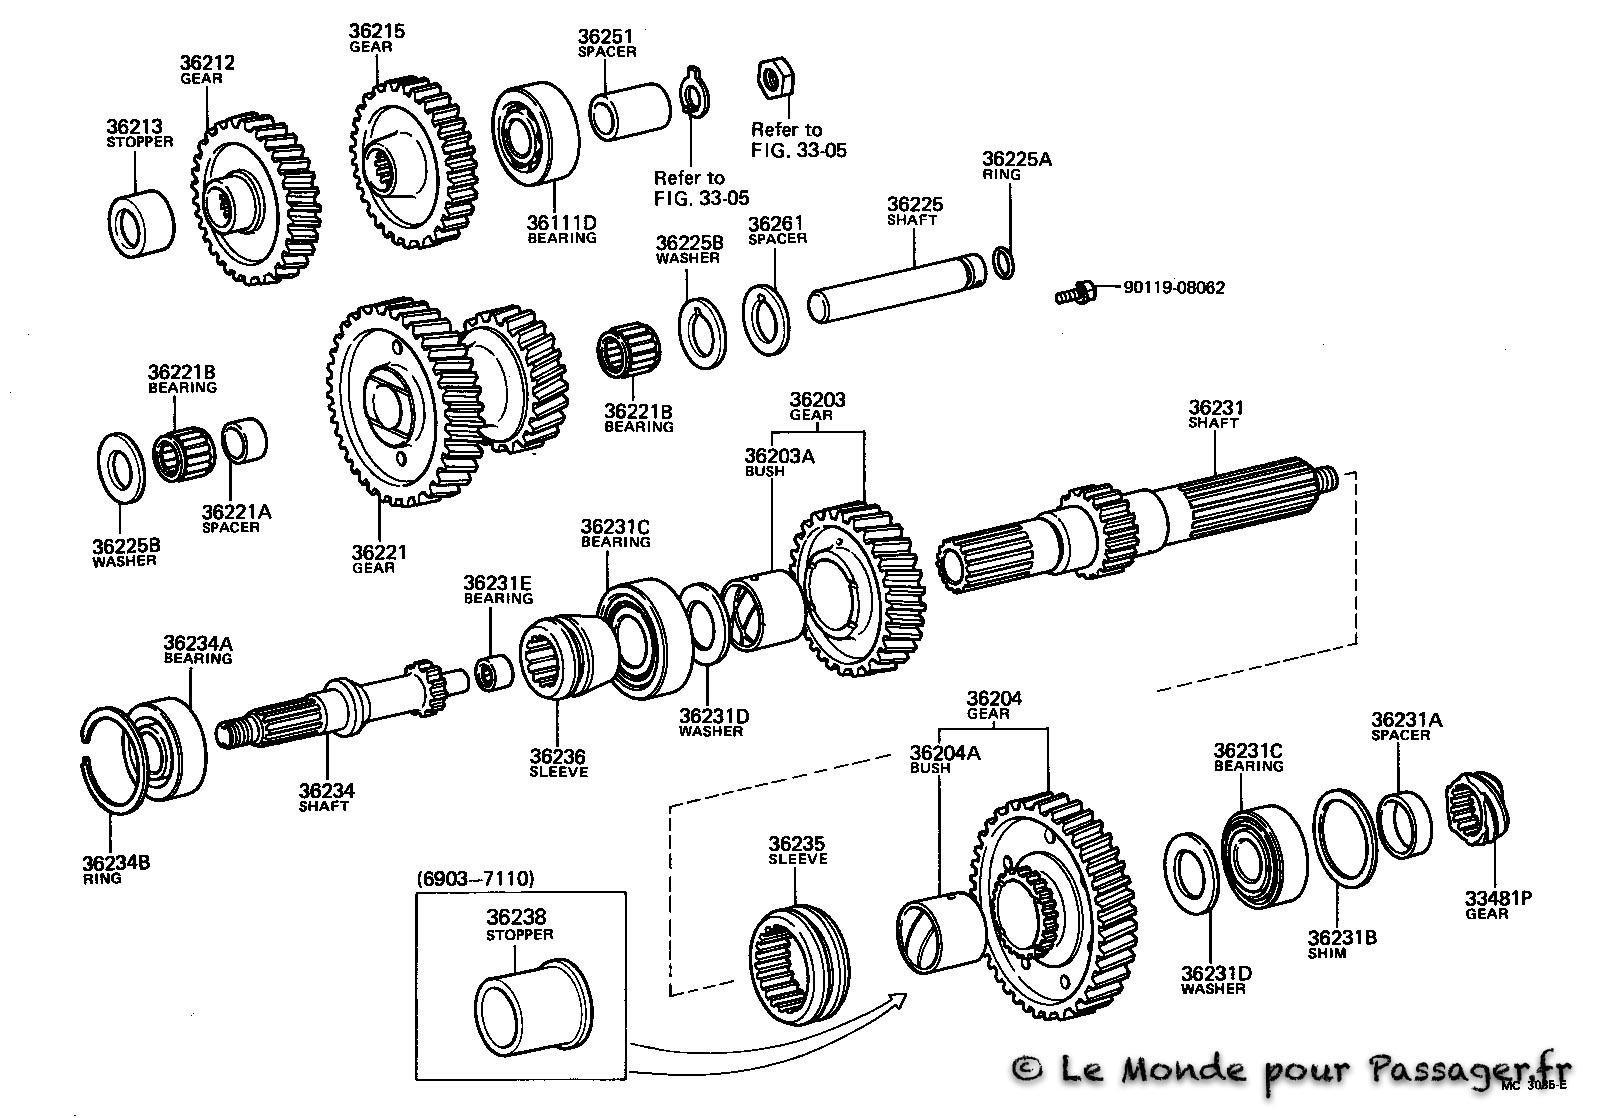 Fj55-Eclatés-Techniques003